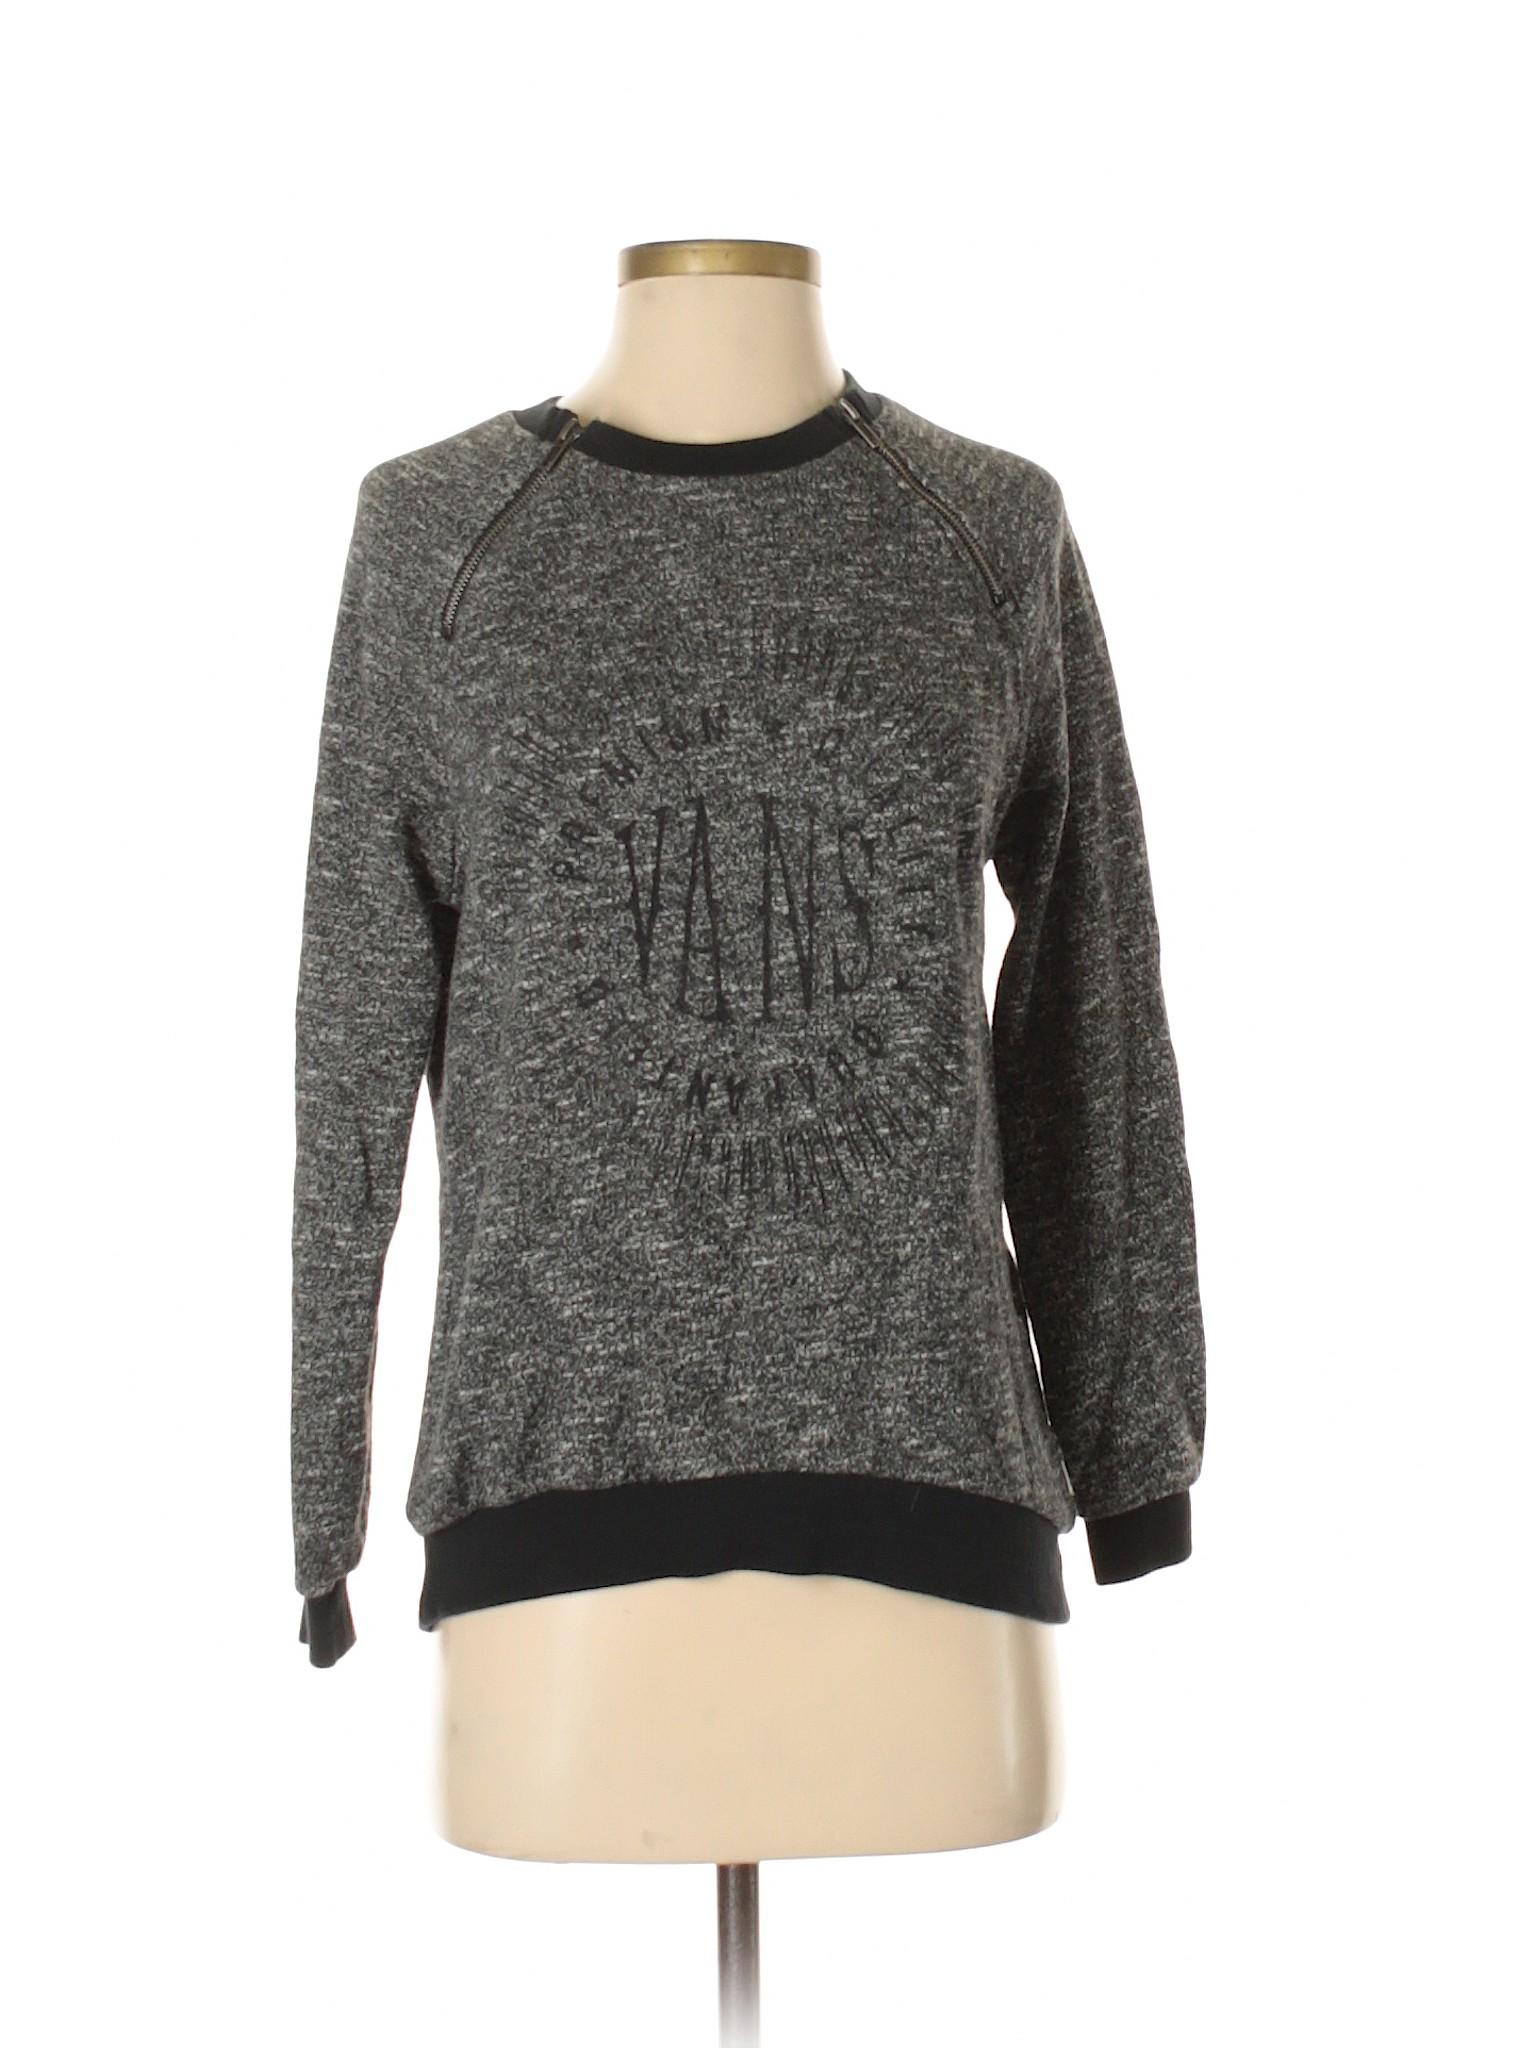 Pullover Boutique Sweater Van Winter Doran qrHrt7v